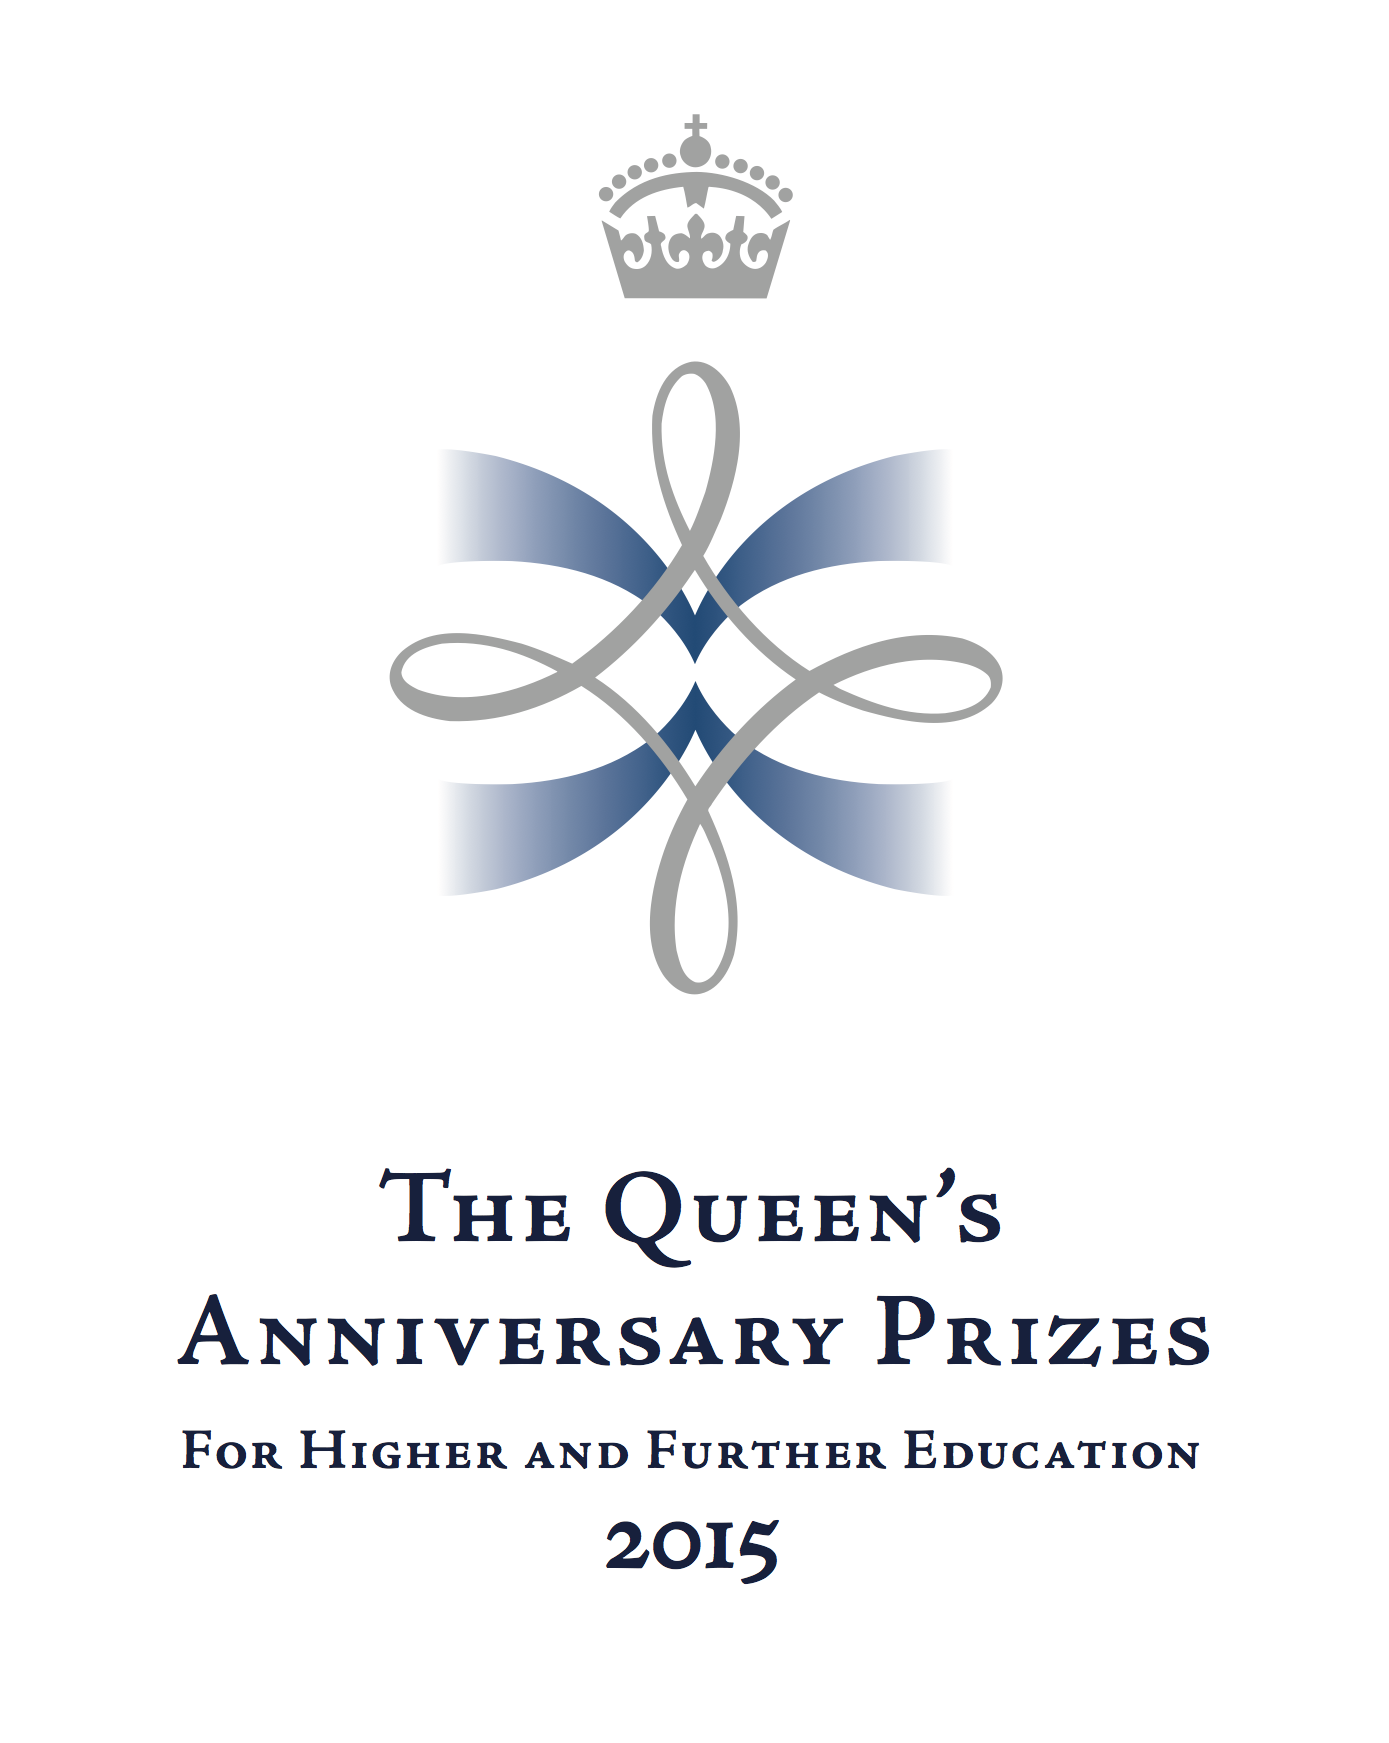 Edinburgh_Napier_University_UAE_Qatar_Saudi_Arabia_Queens_Anniversary_Prizes_2015_CMYK.png